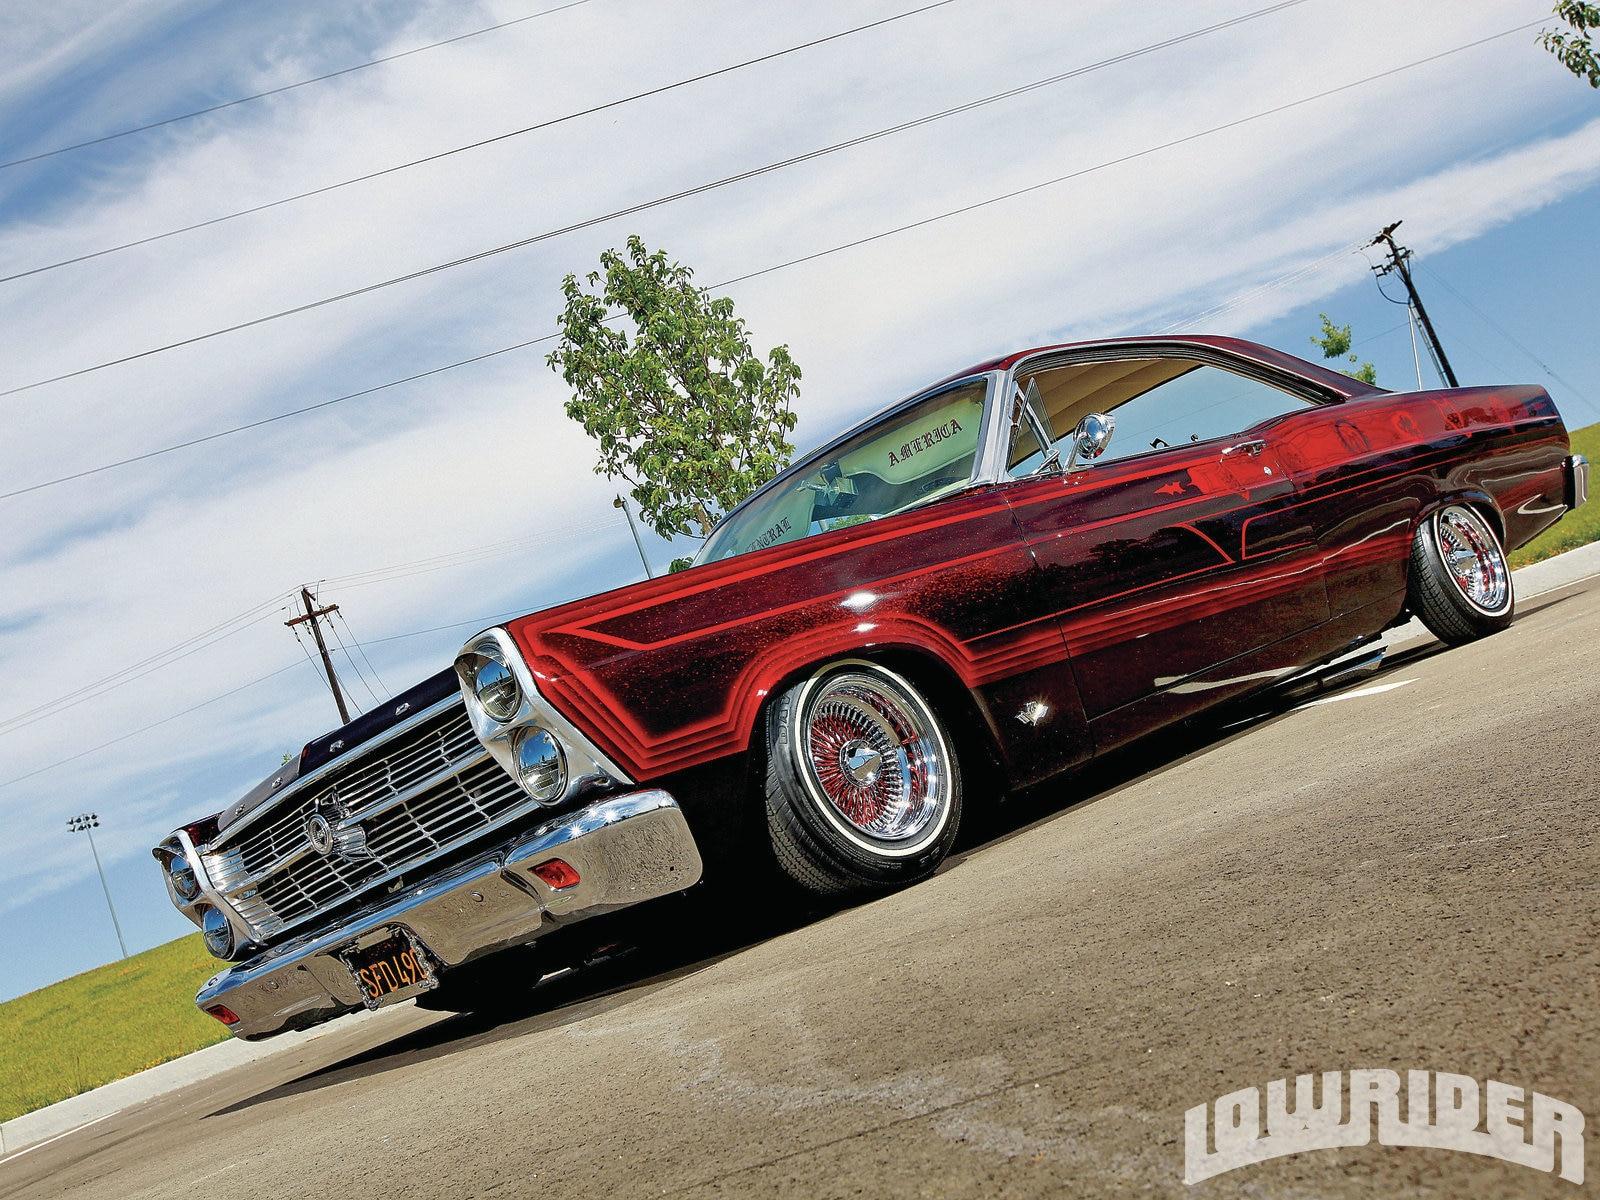 10 2 Wire >> 1966 Ford Fairlane 500 - Lowrider Magazine